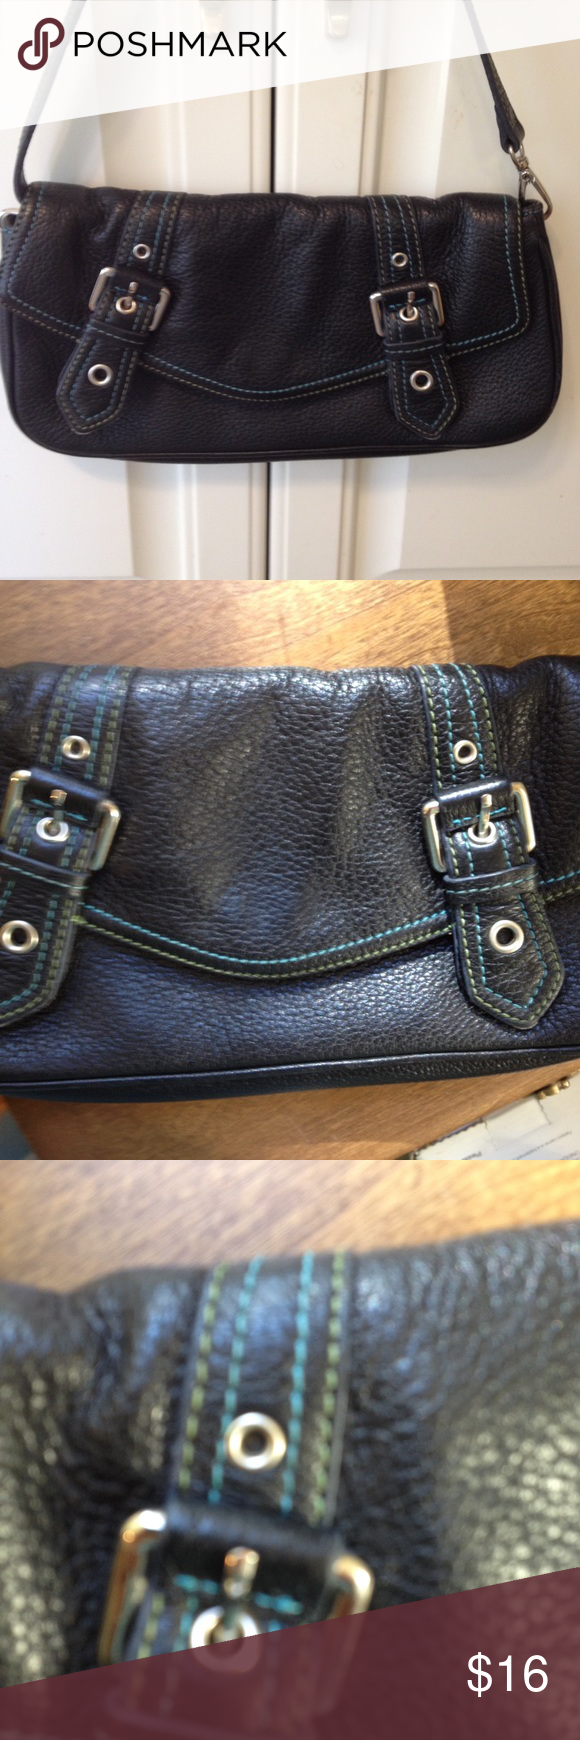 Wilson's Genuine Pebbled Leather Bag Wilsons leather bag